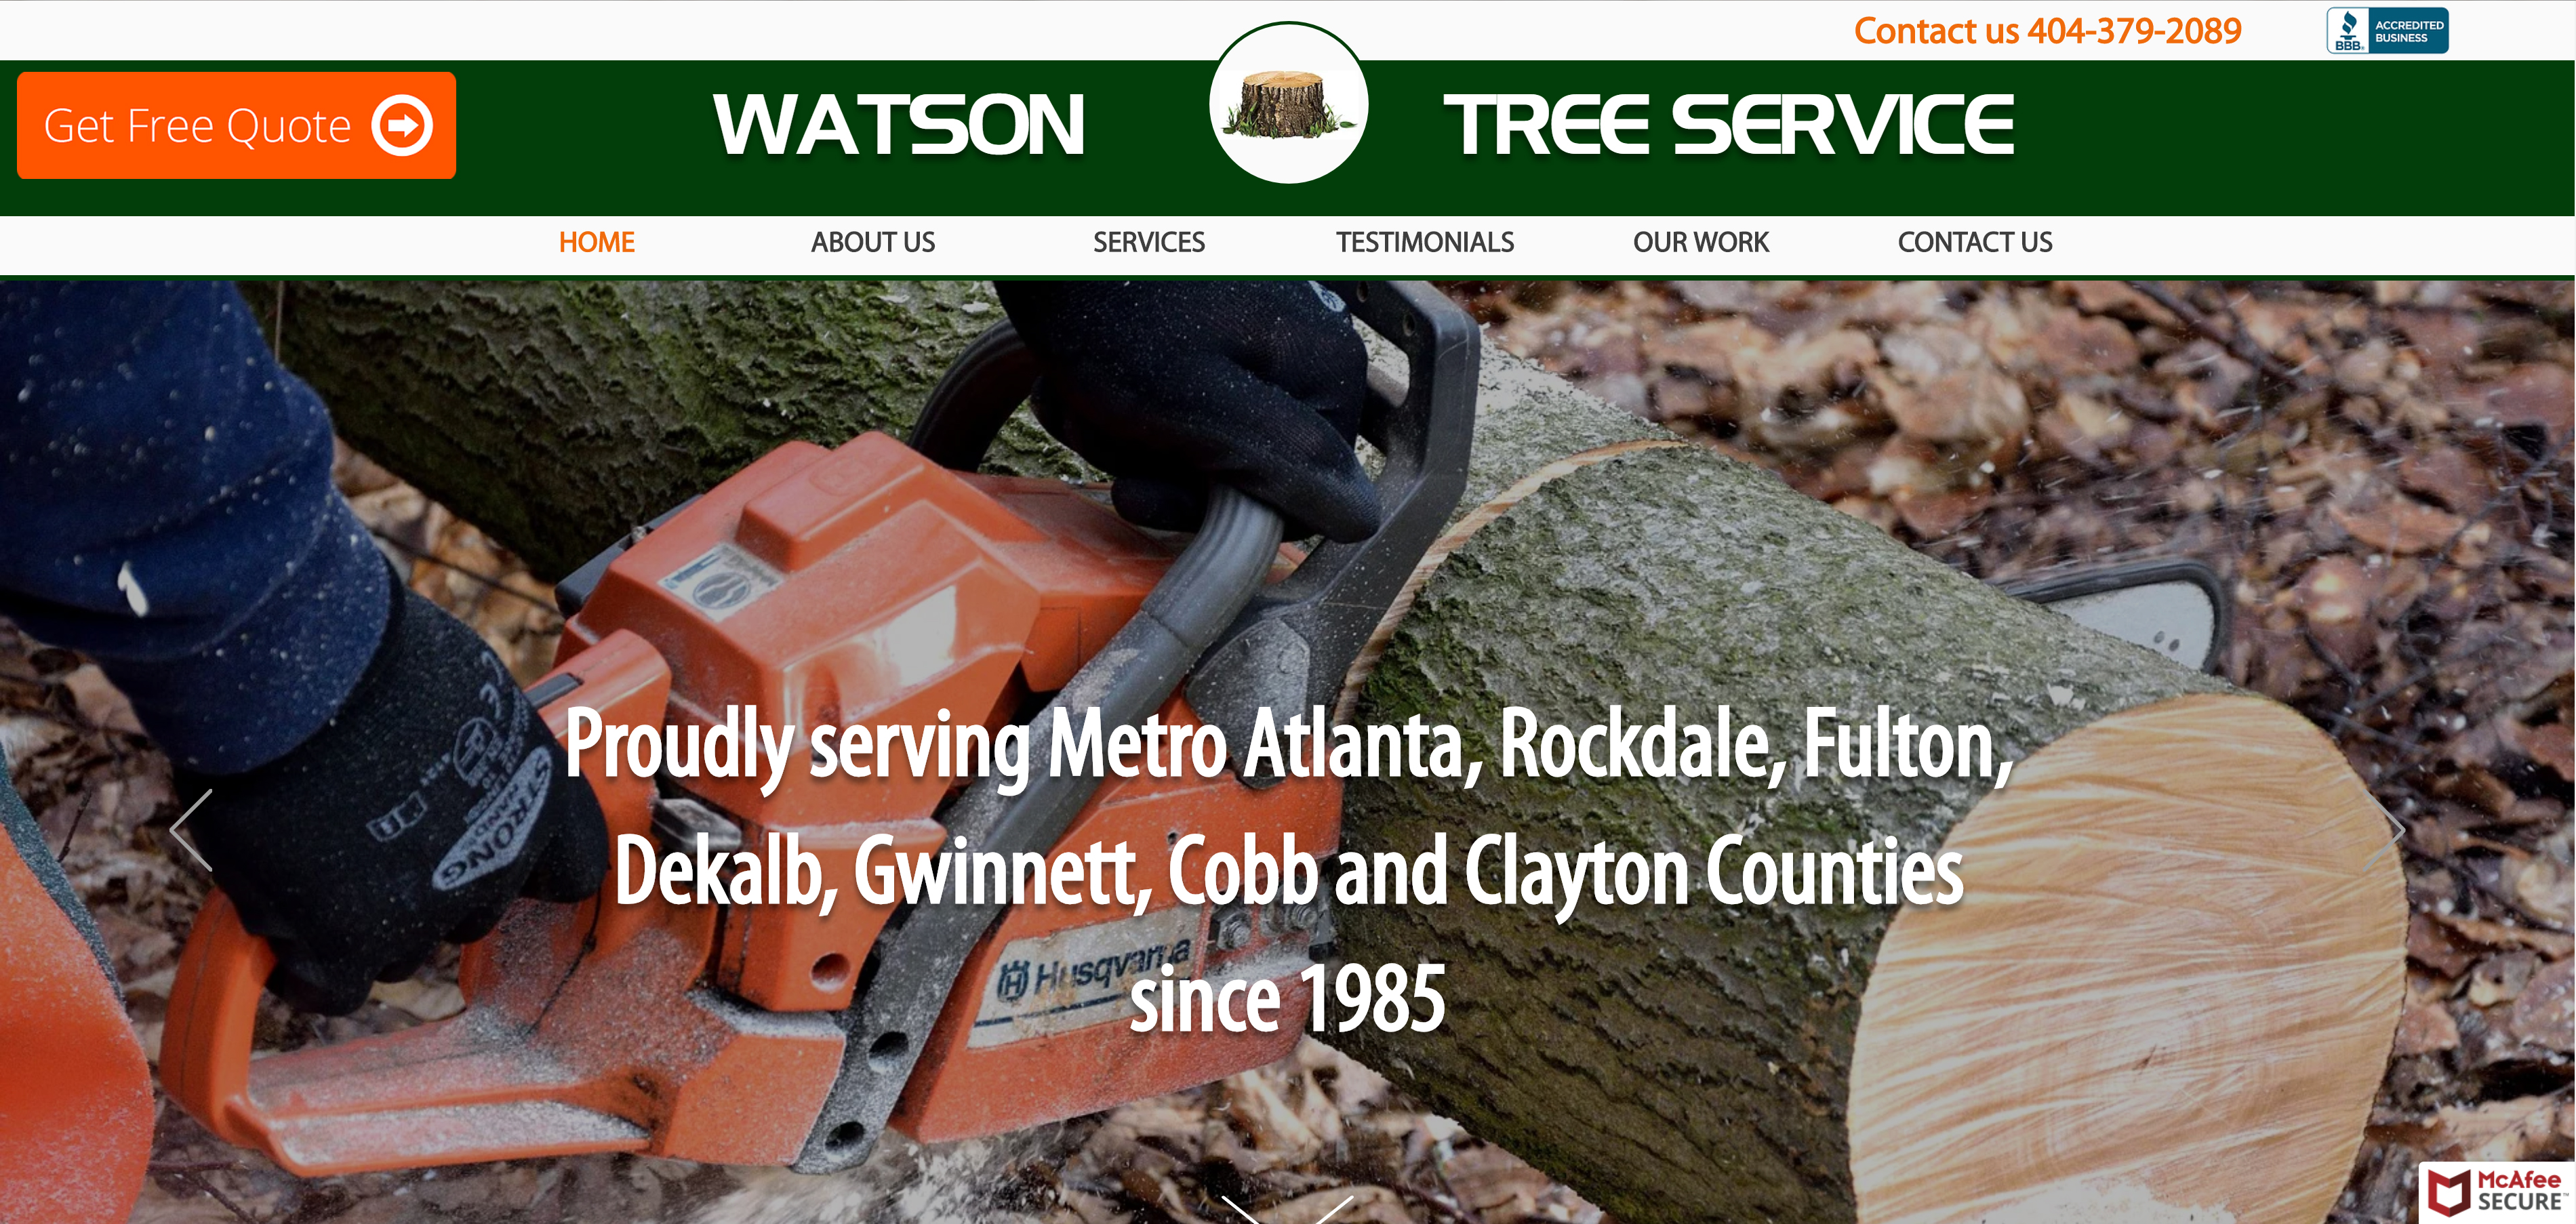 Watson Tree Service